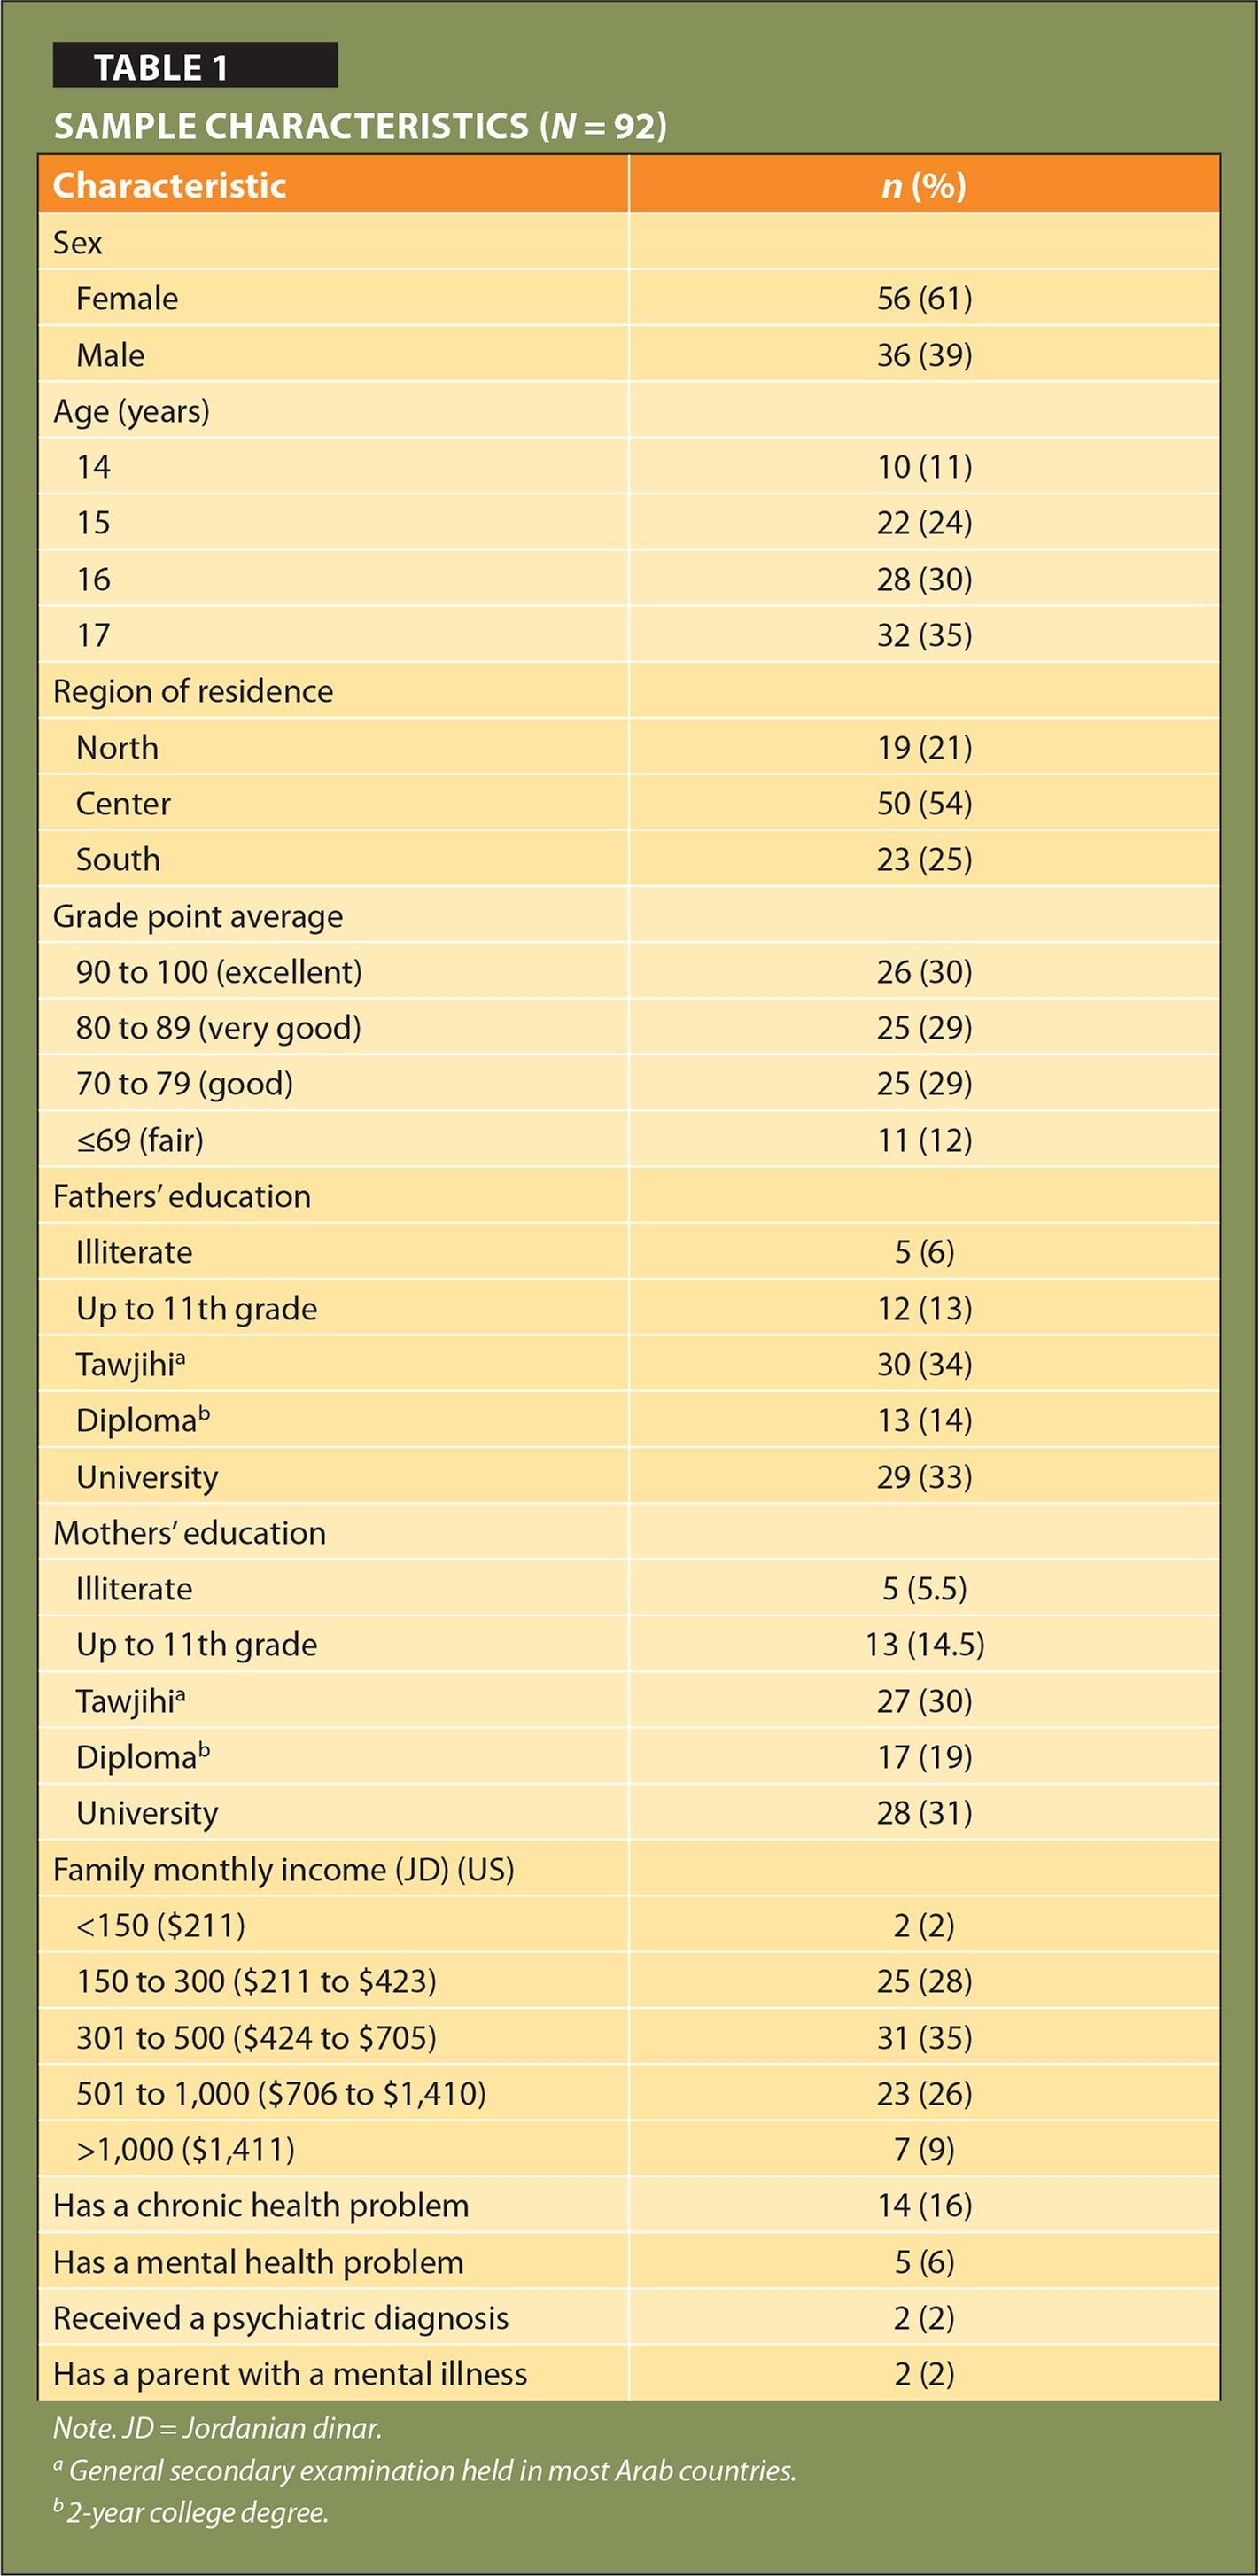 Sample Characteristics (N = 92)